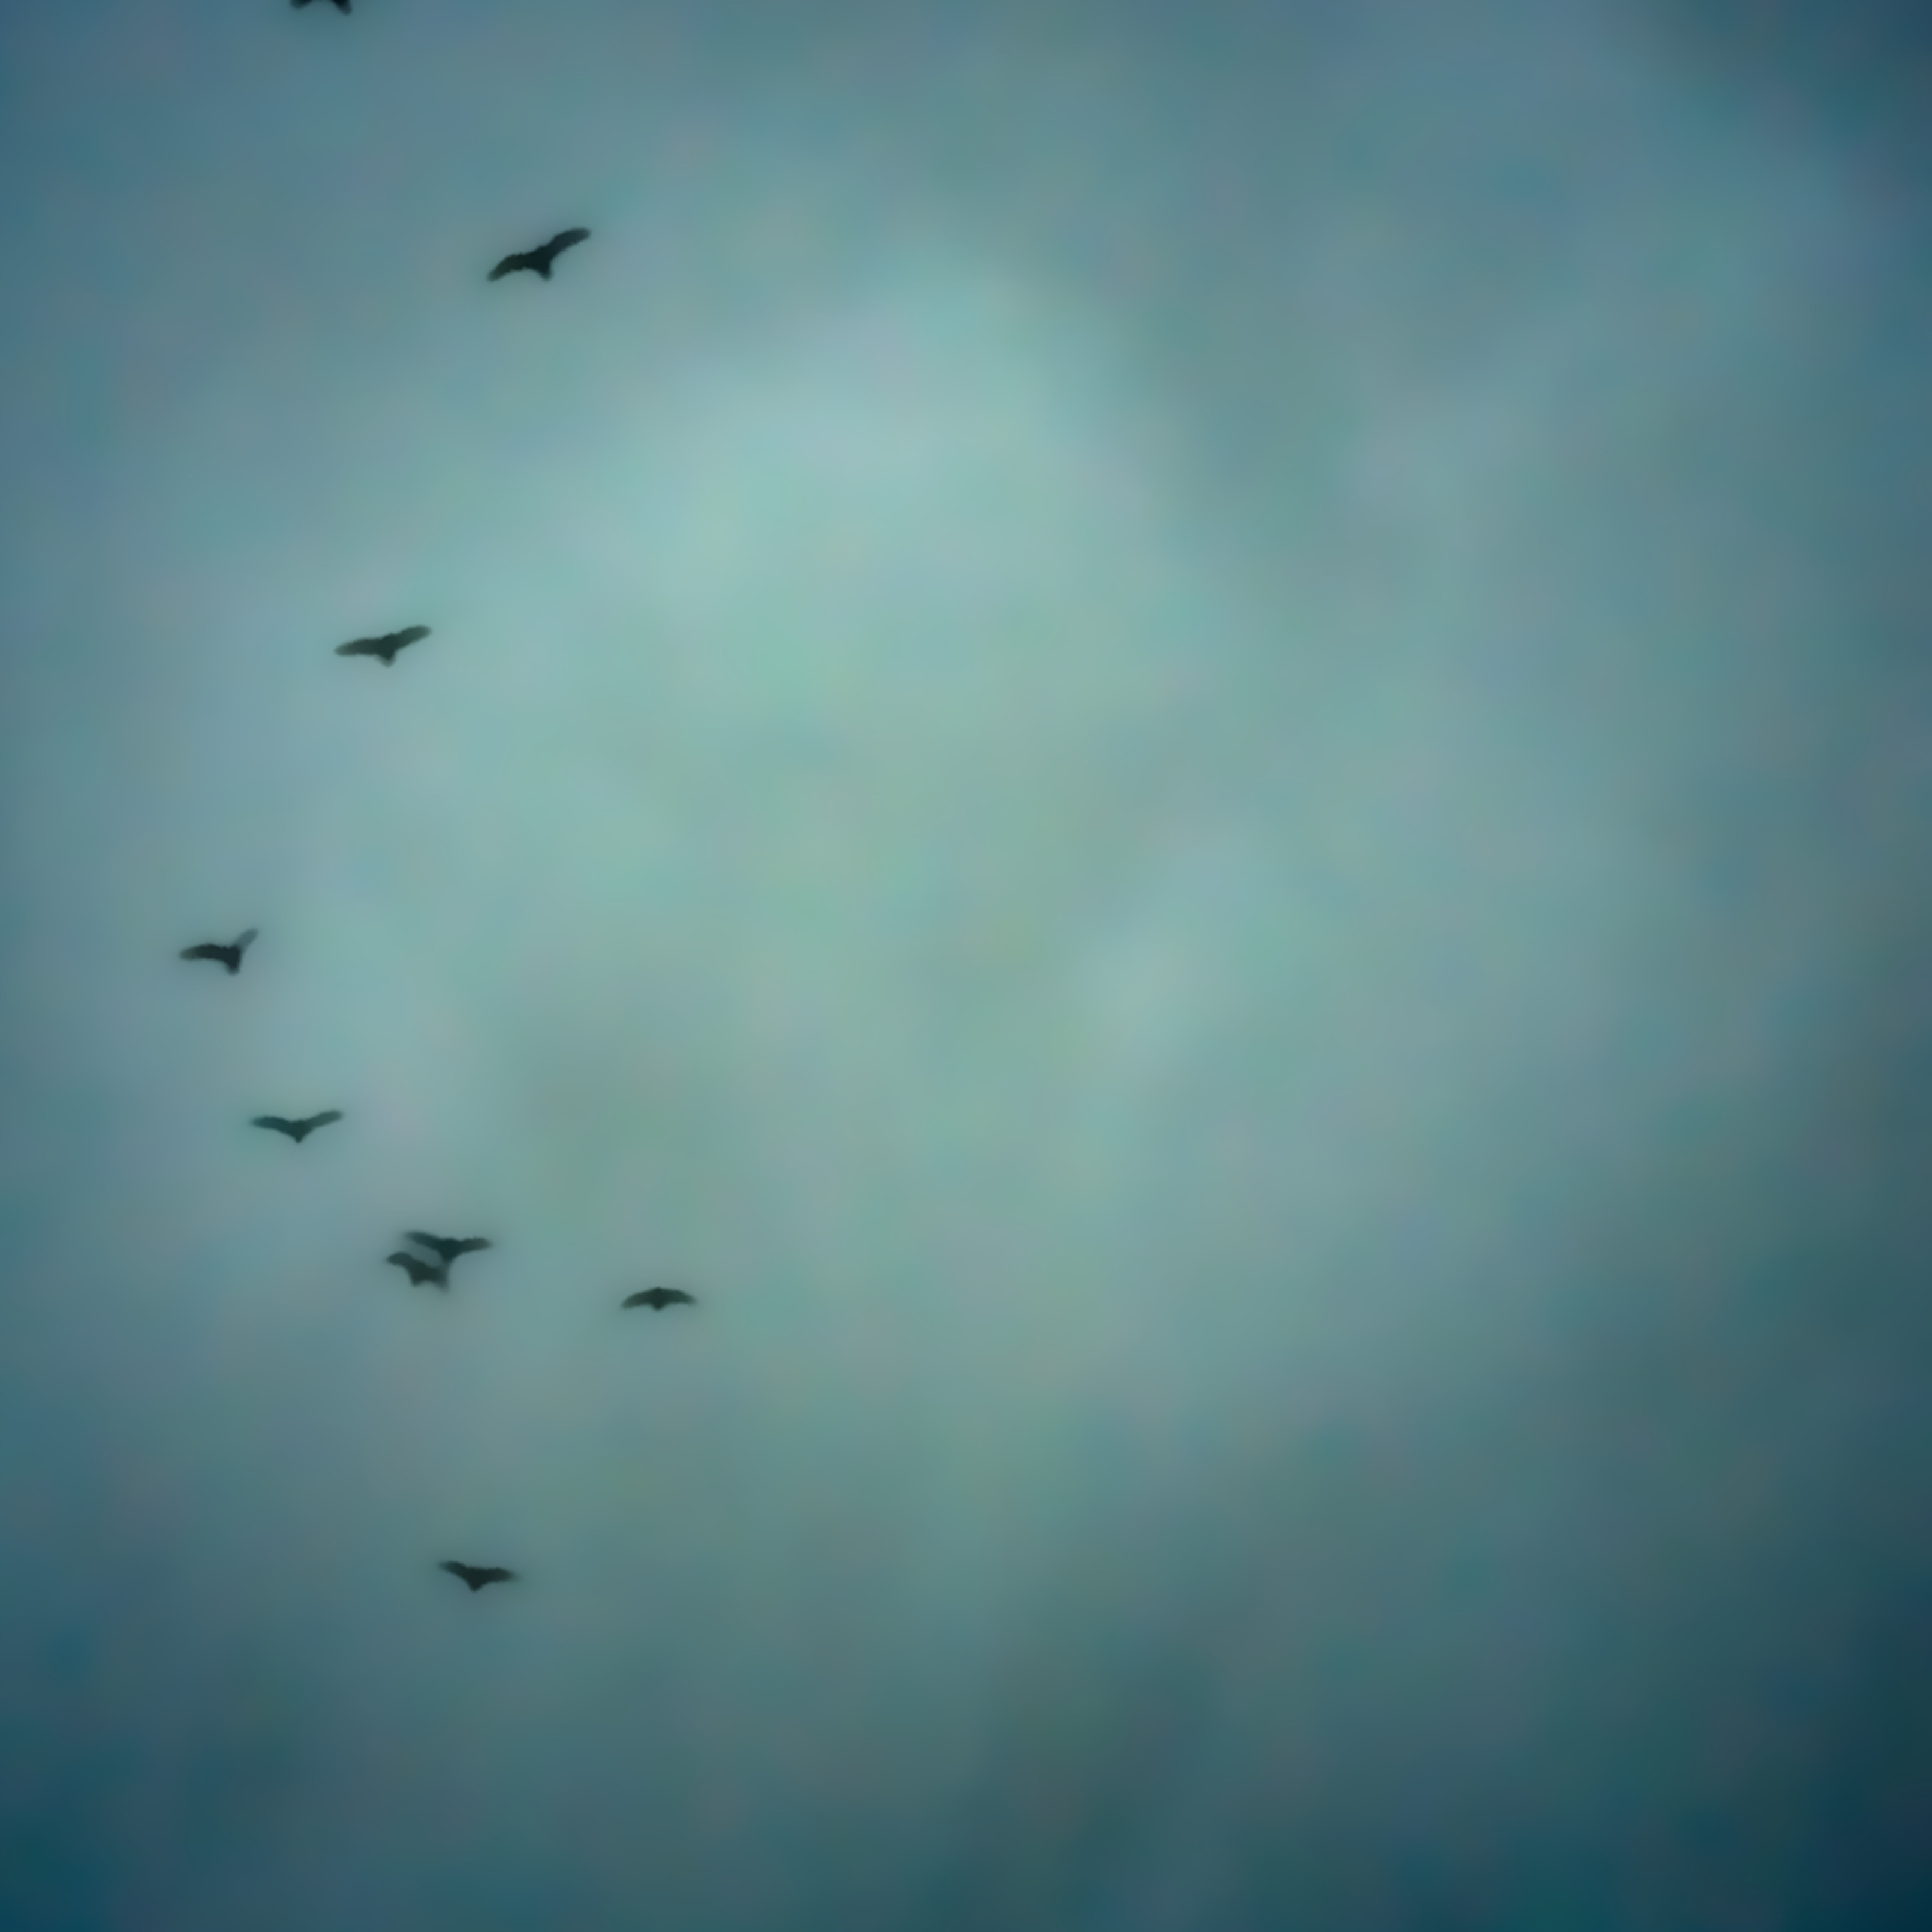 Sky hwcvx5